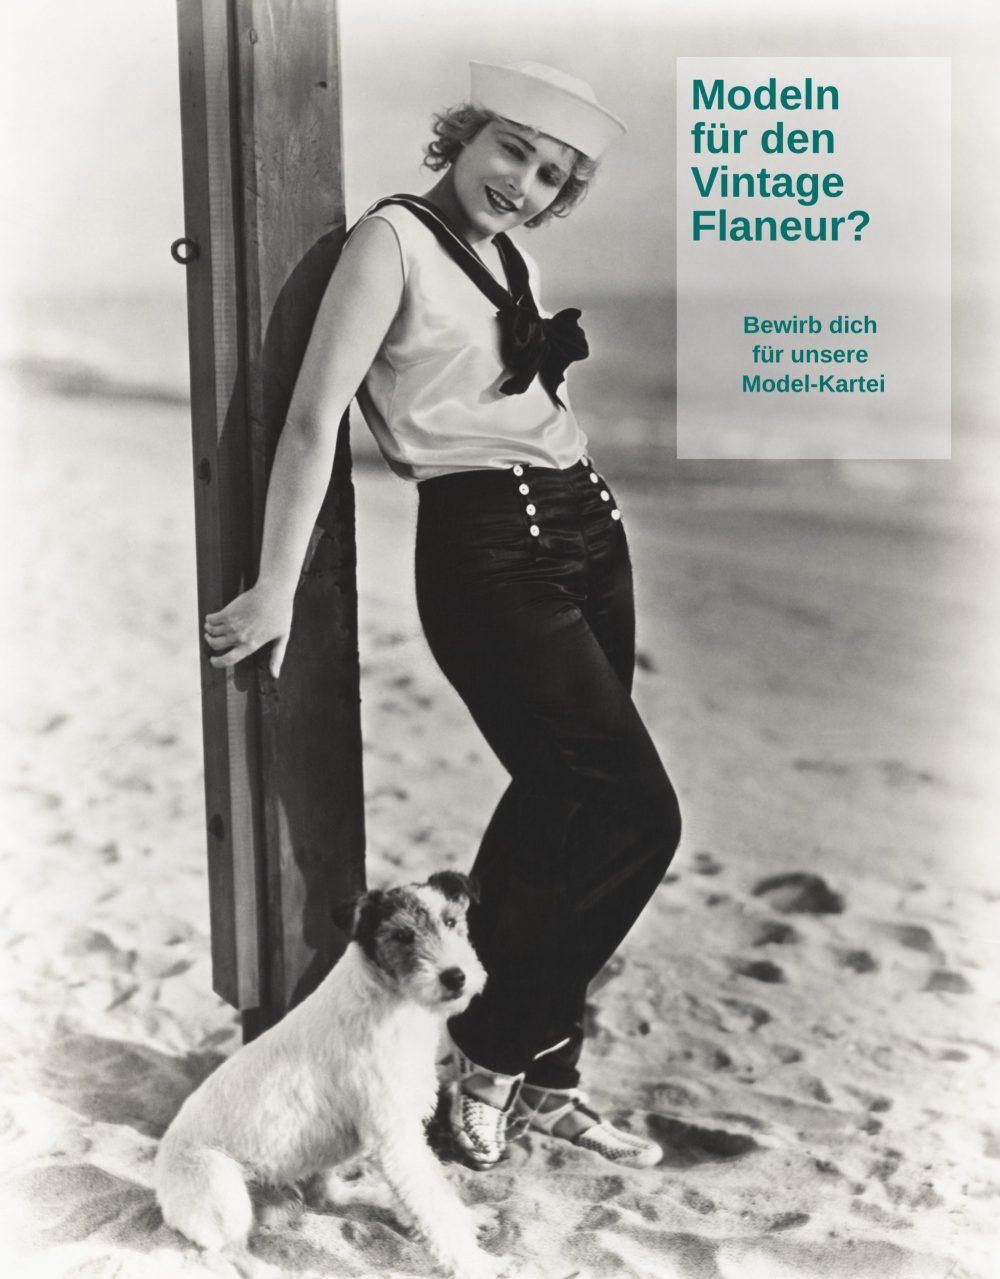 Model für den Vintage Flaneur